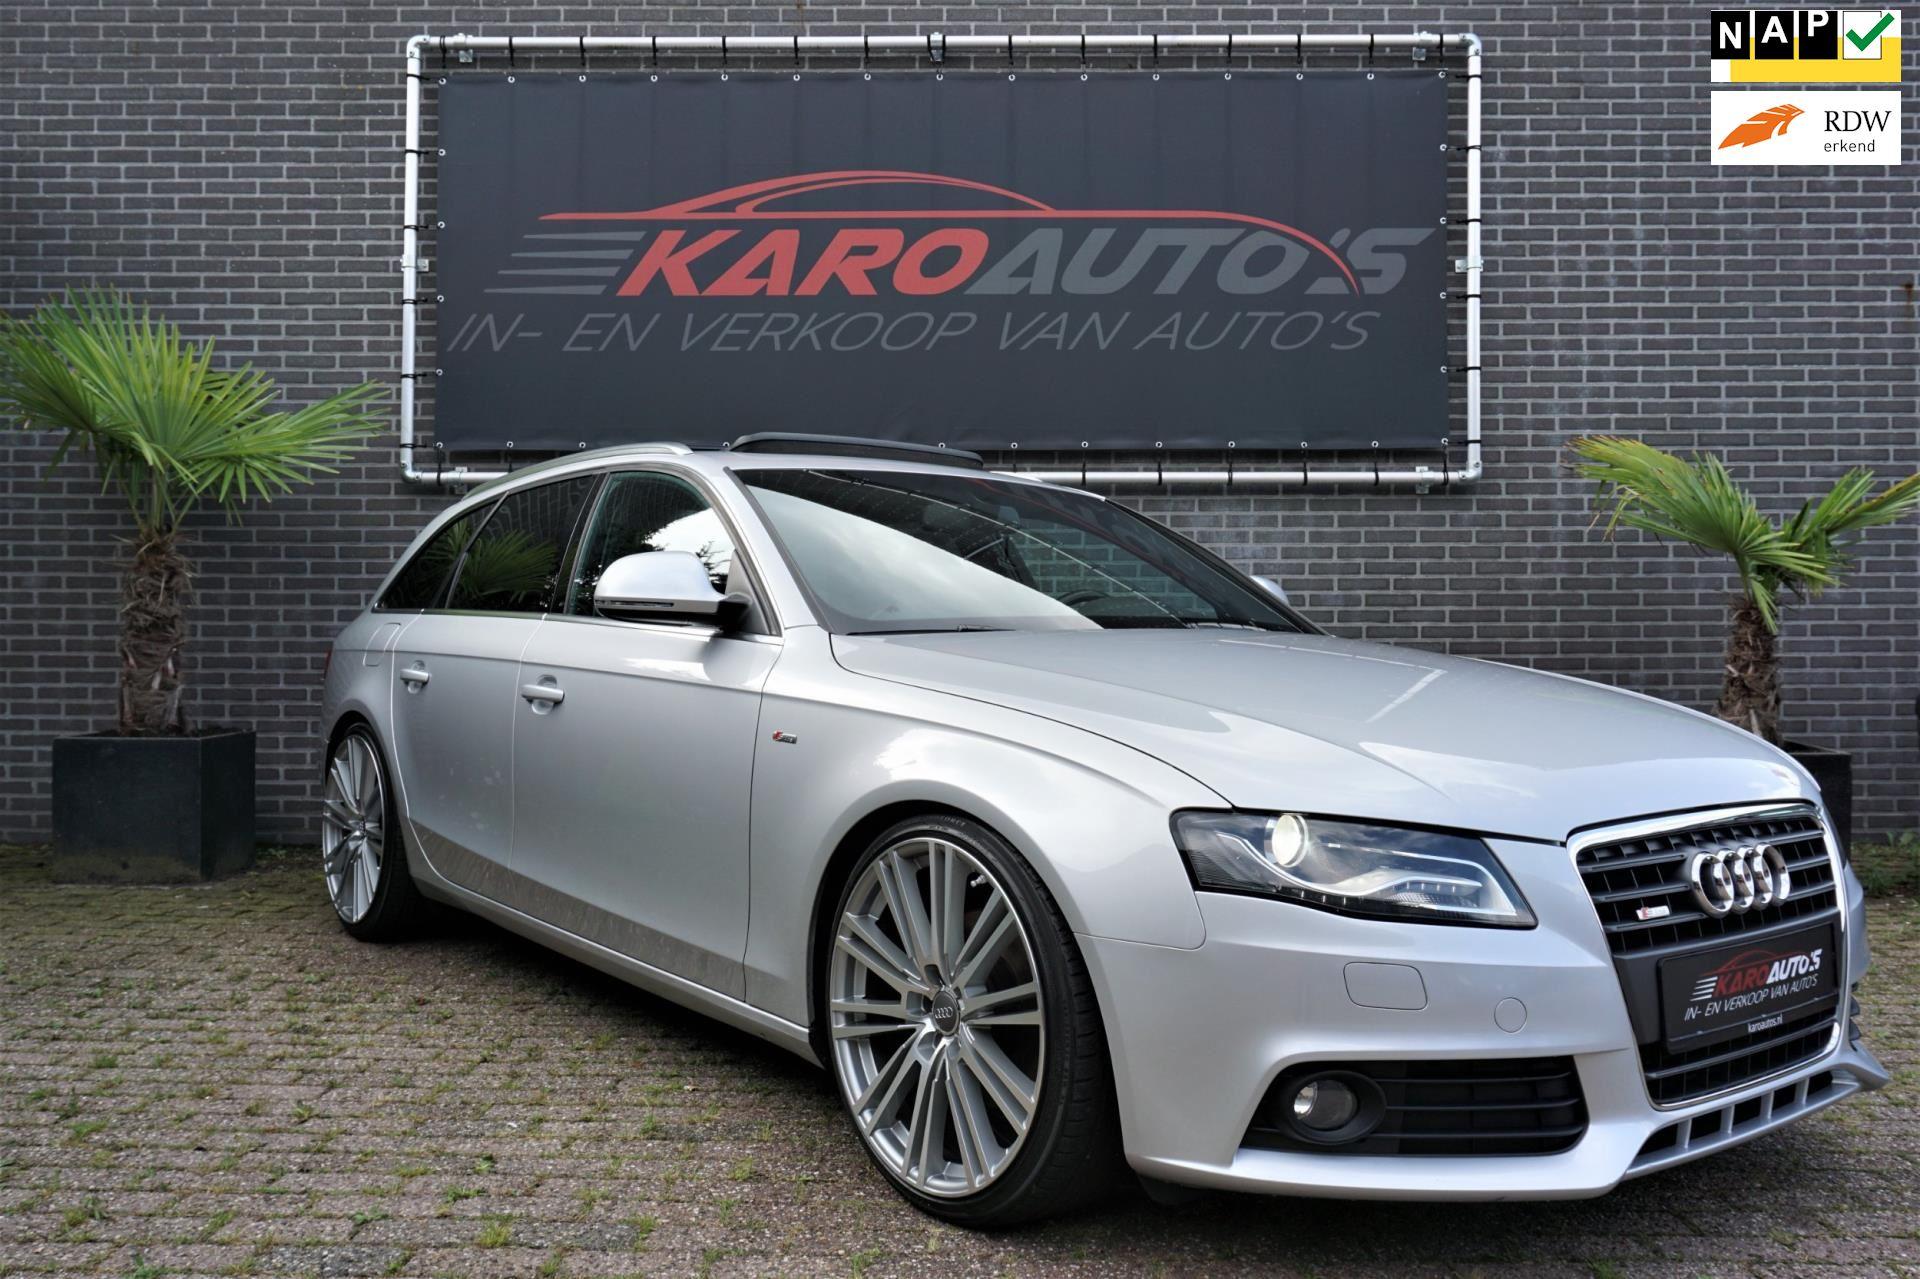 Audi A4 Avant occasion - KARO Auto's